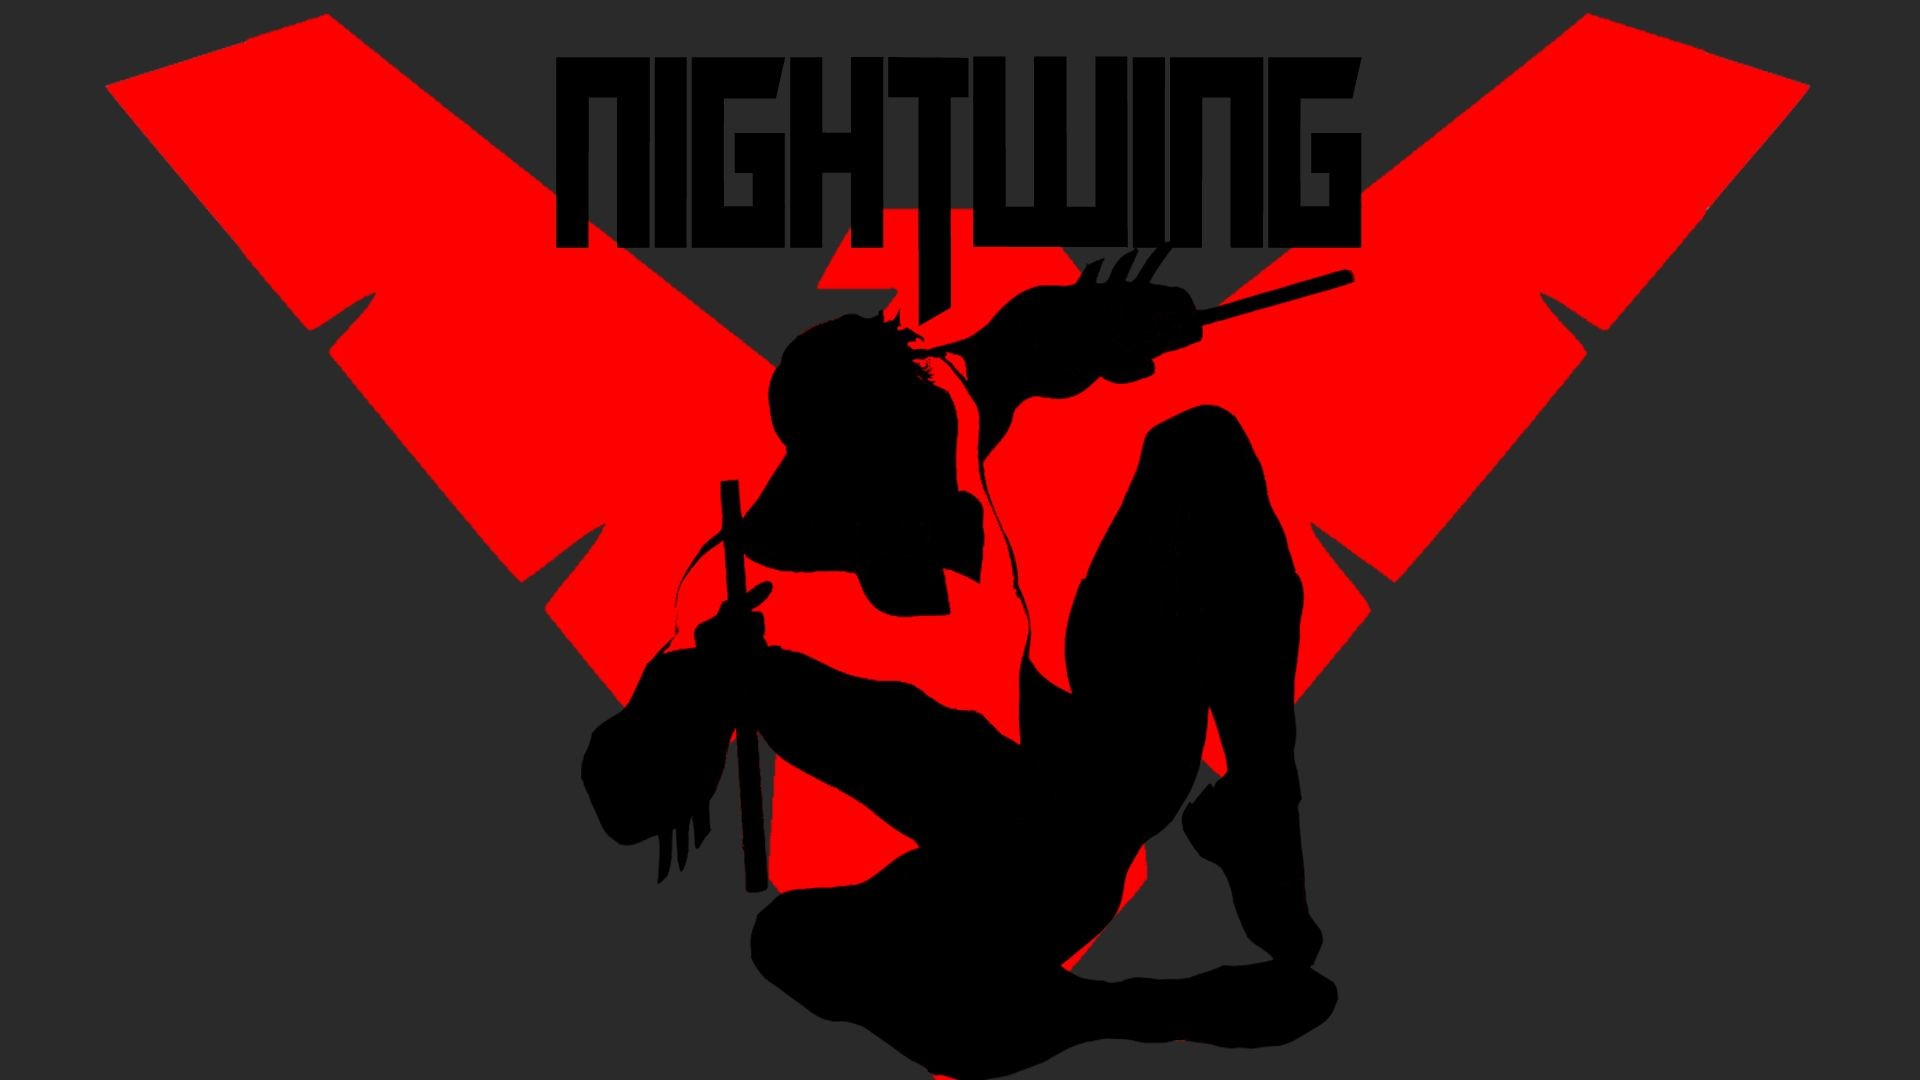 Res: 1920x1080, Nightwing Pop-art Wallpaper by blades0100 on DeviantArt